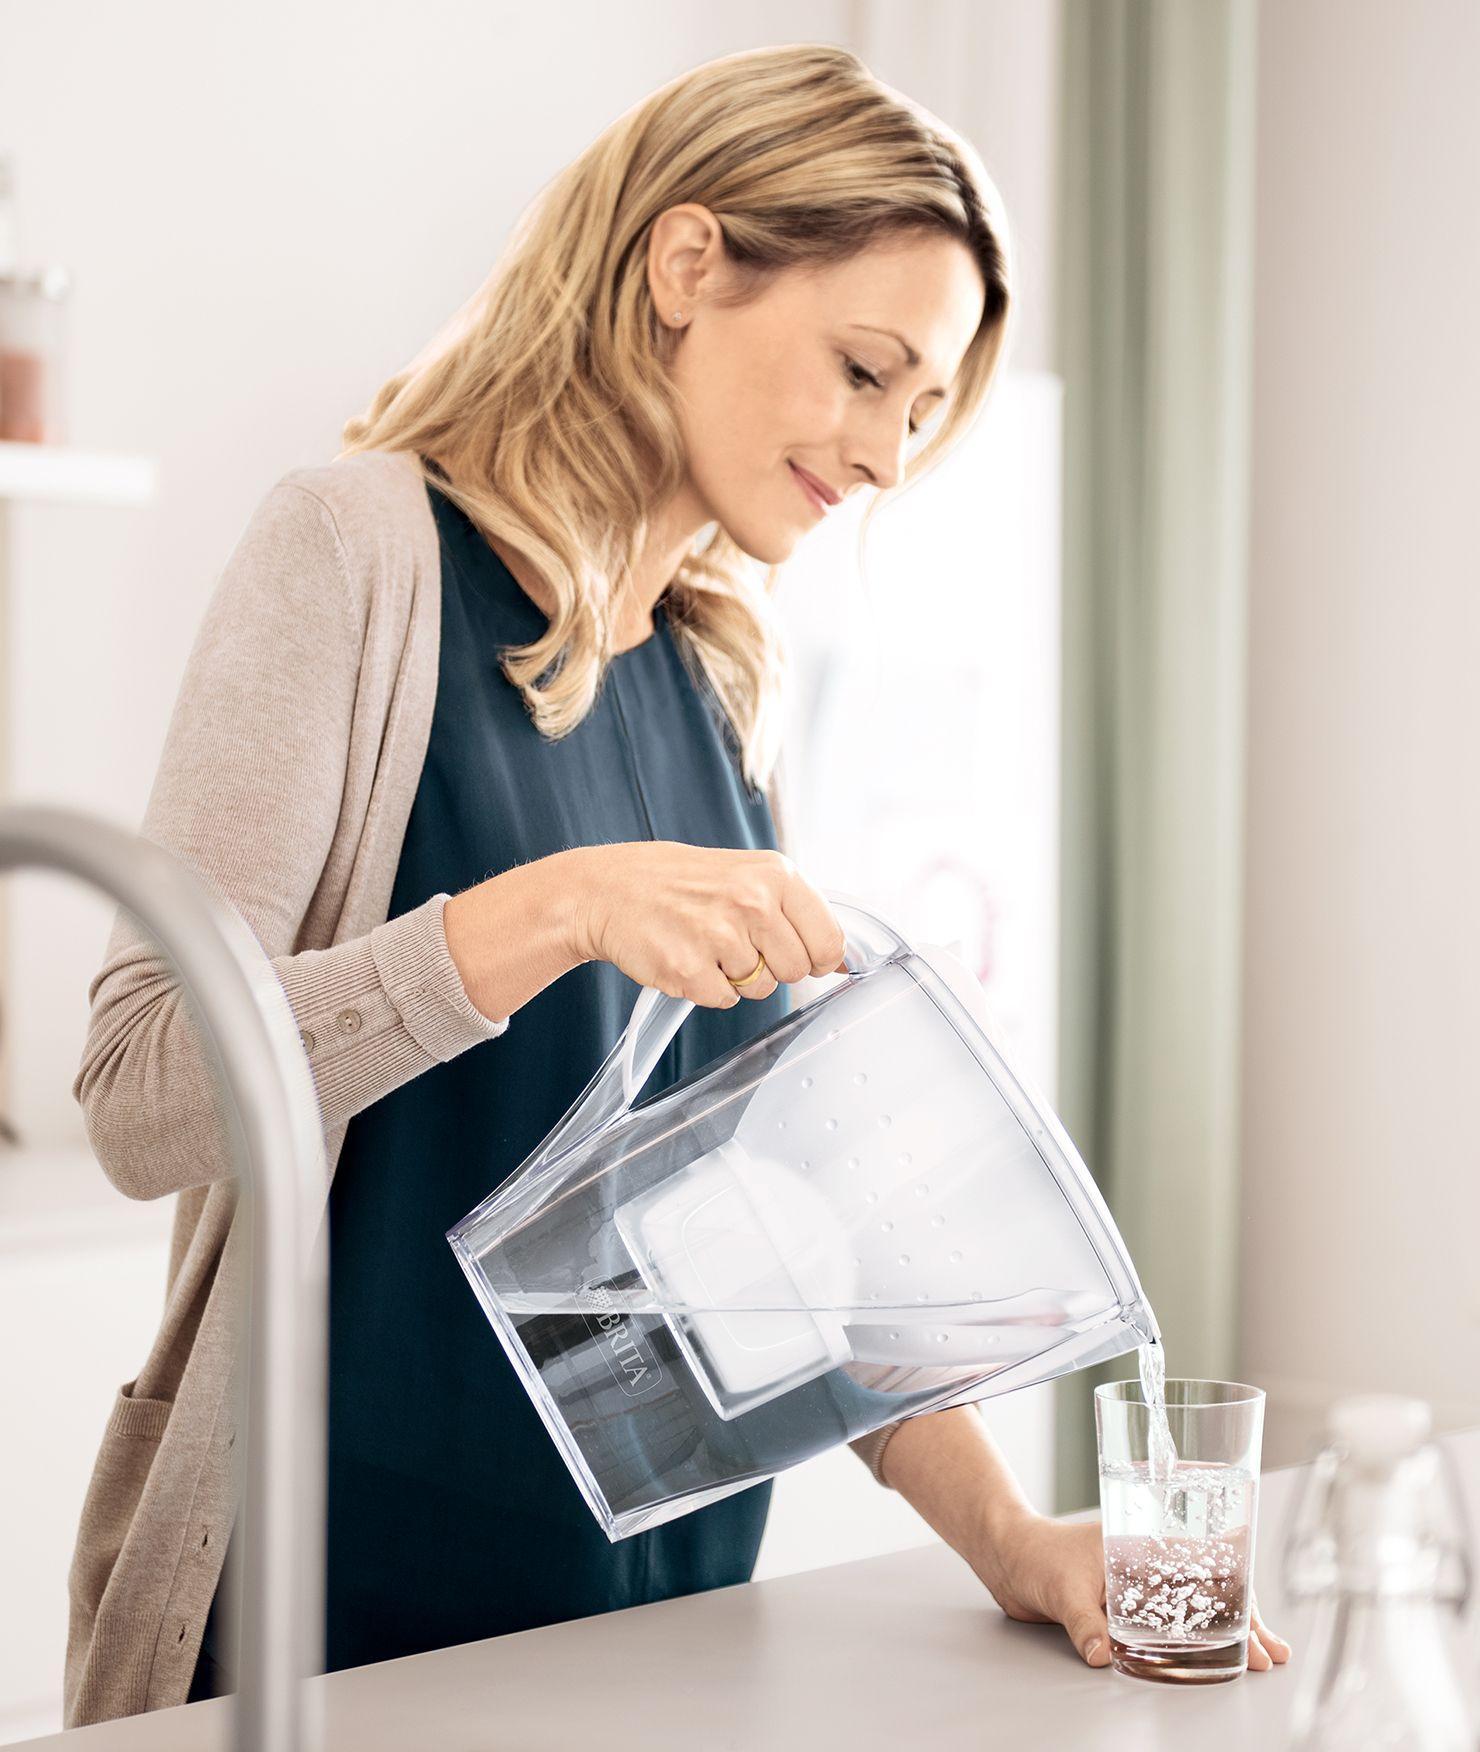 BRITA fill&enjoy Marella Cool white: Frau in Küche